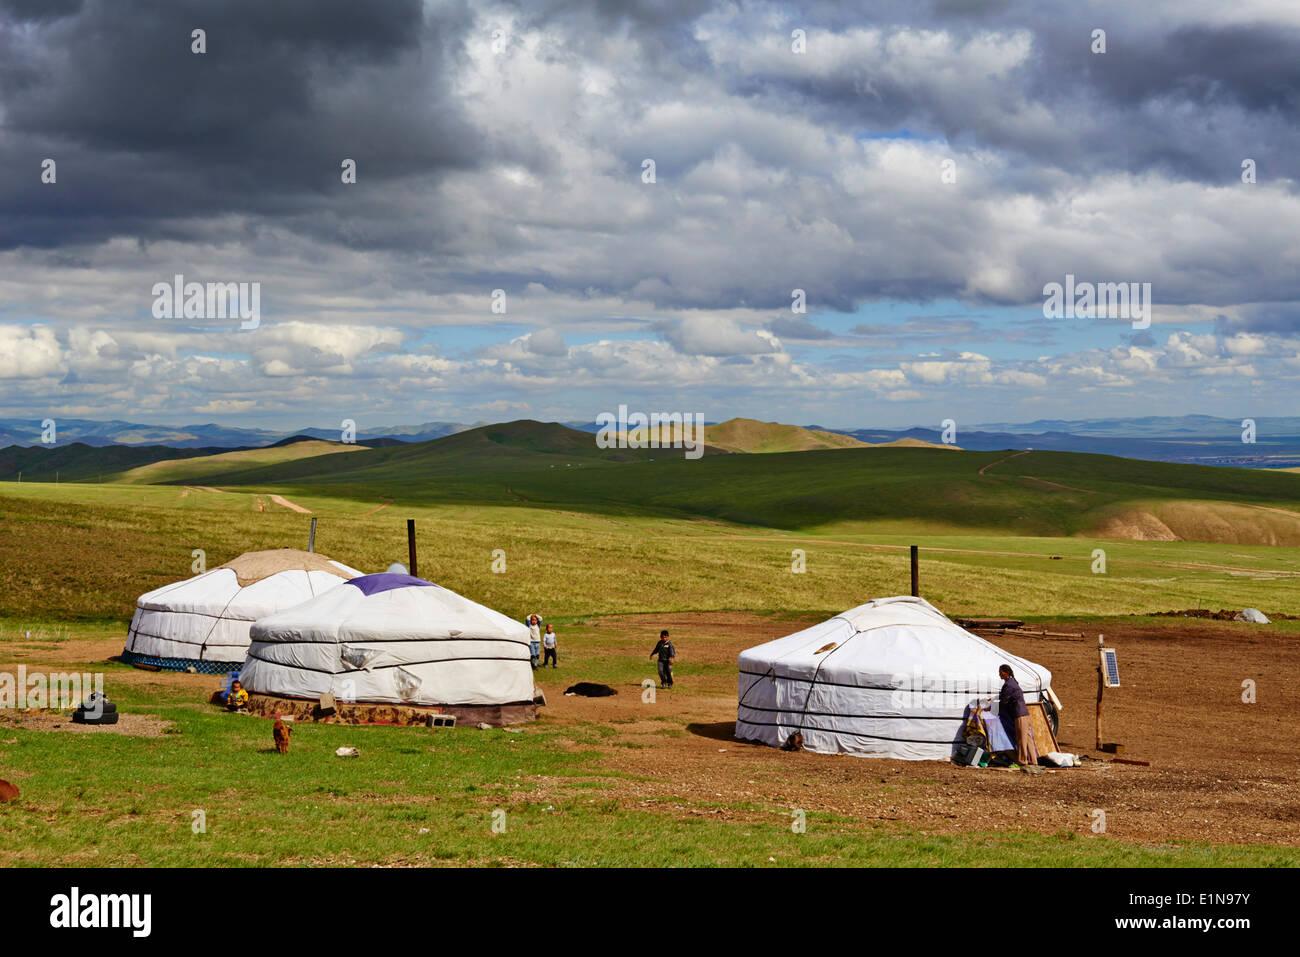 Mongolia, Tov province, nomad camp - Stock Image